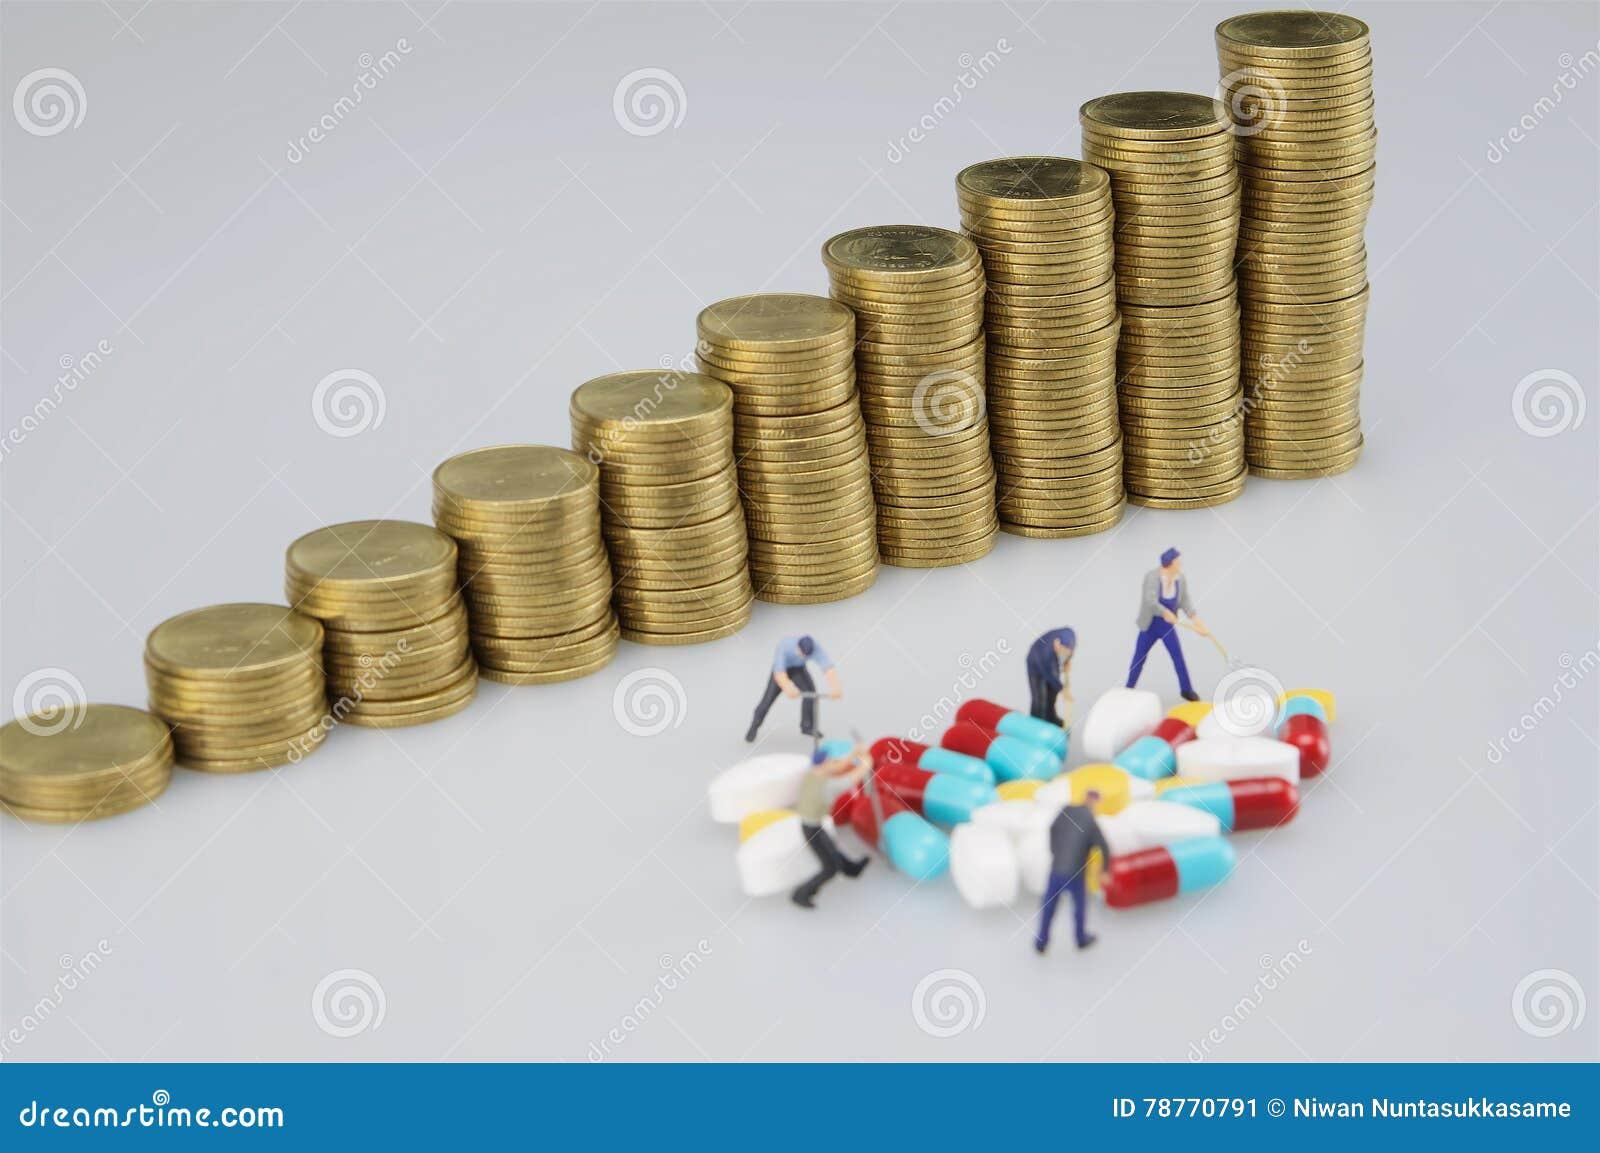 Stapel Goldmünze und Miniaturleute mit Medizin